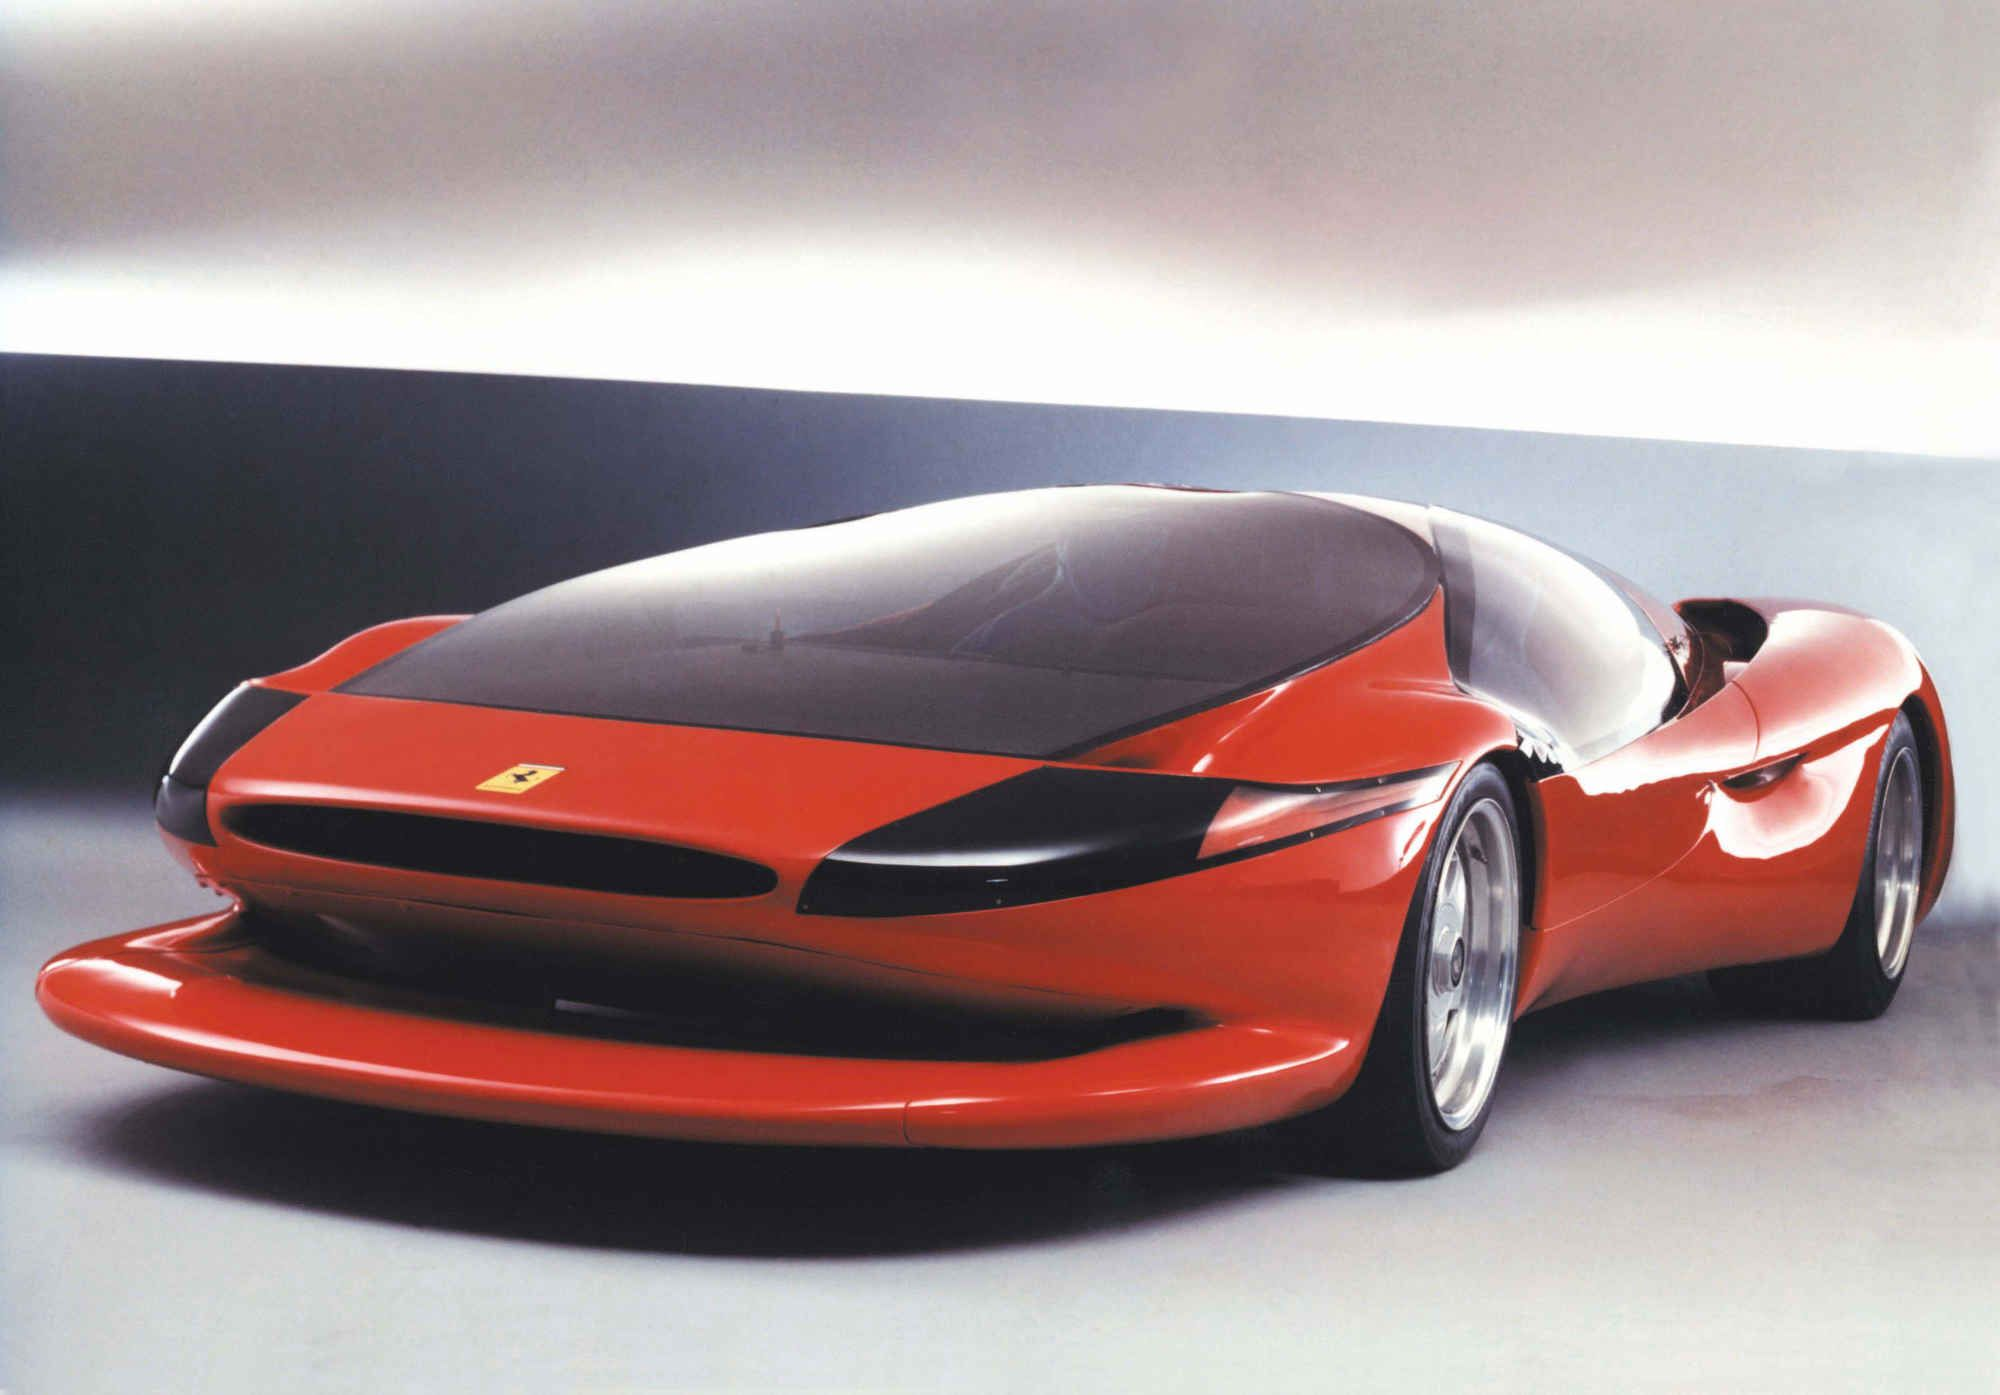 89c752caffec557414916e7b24fea129 Terrific Ferrari Mondial Cabrio In Vendita Cars Trend